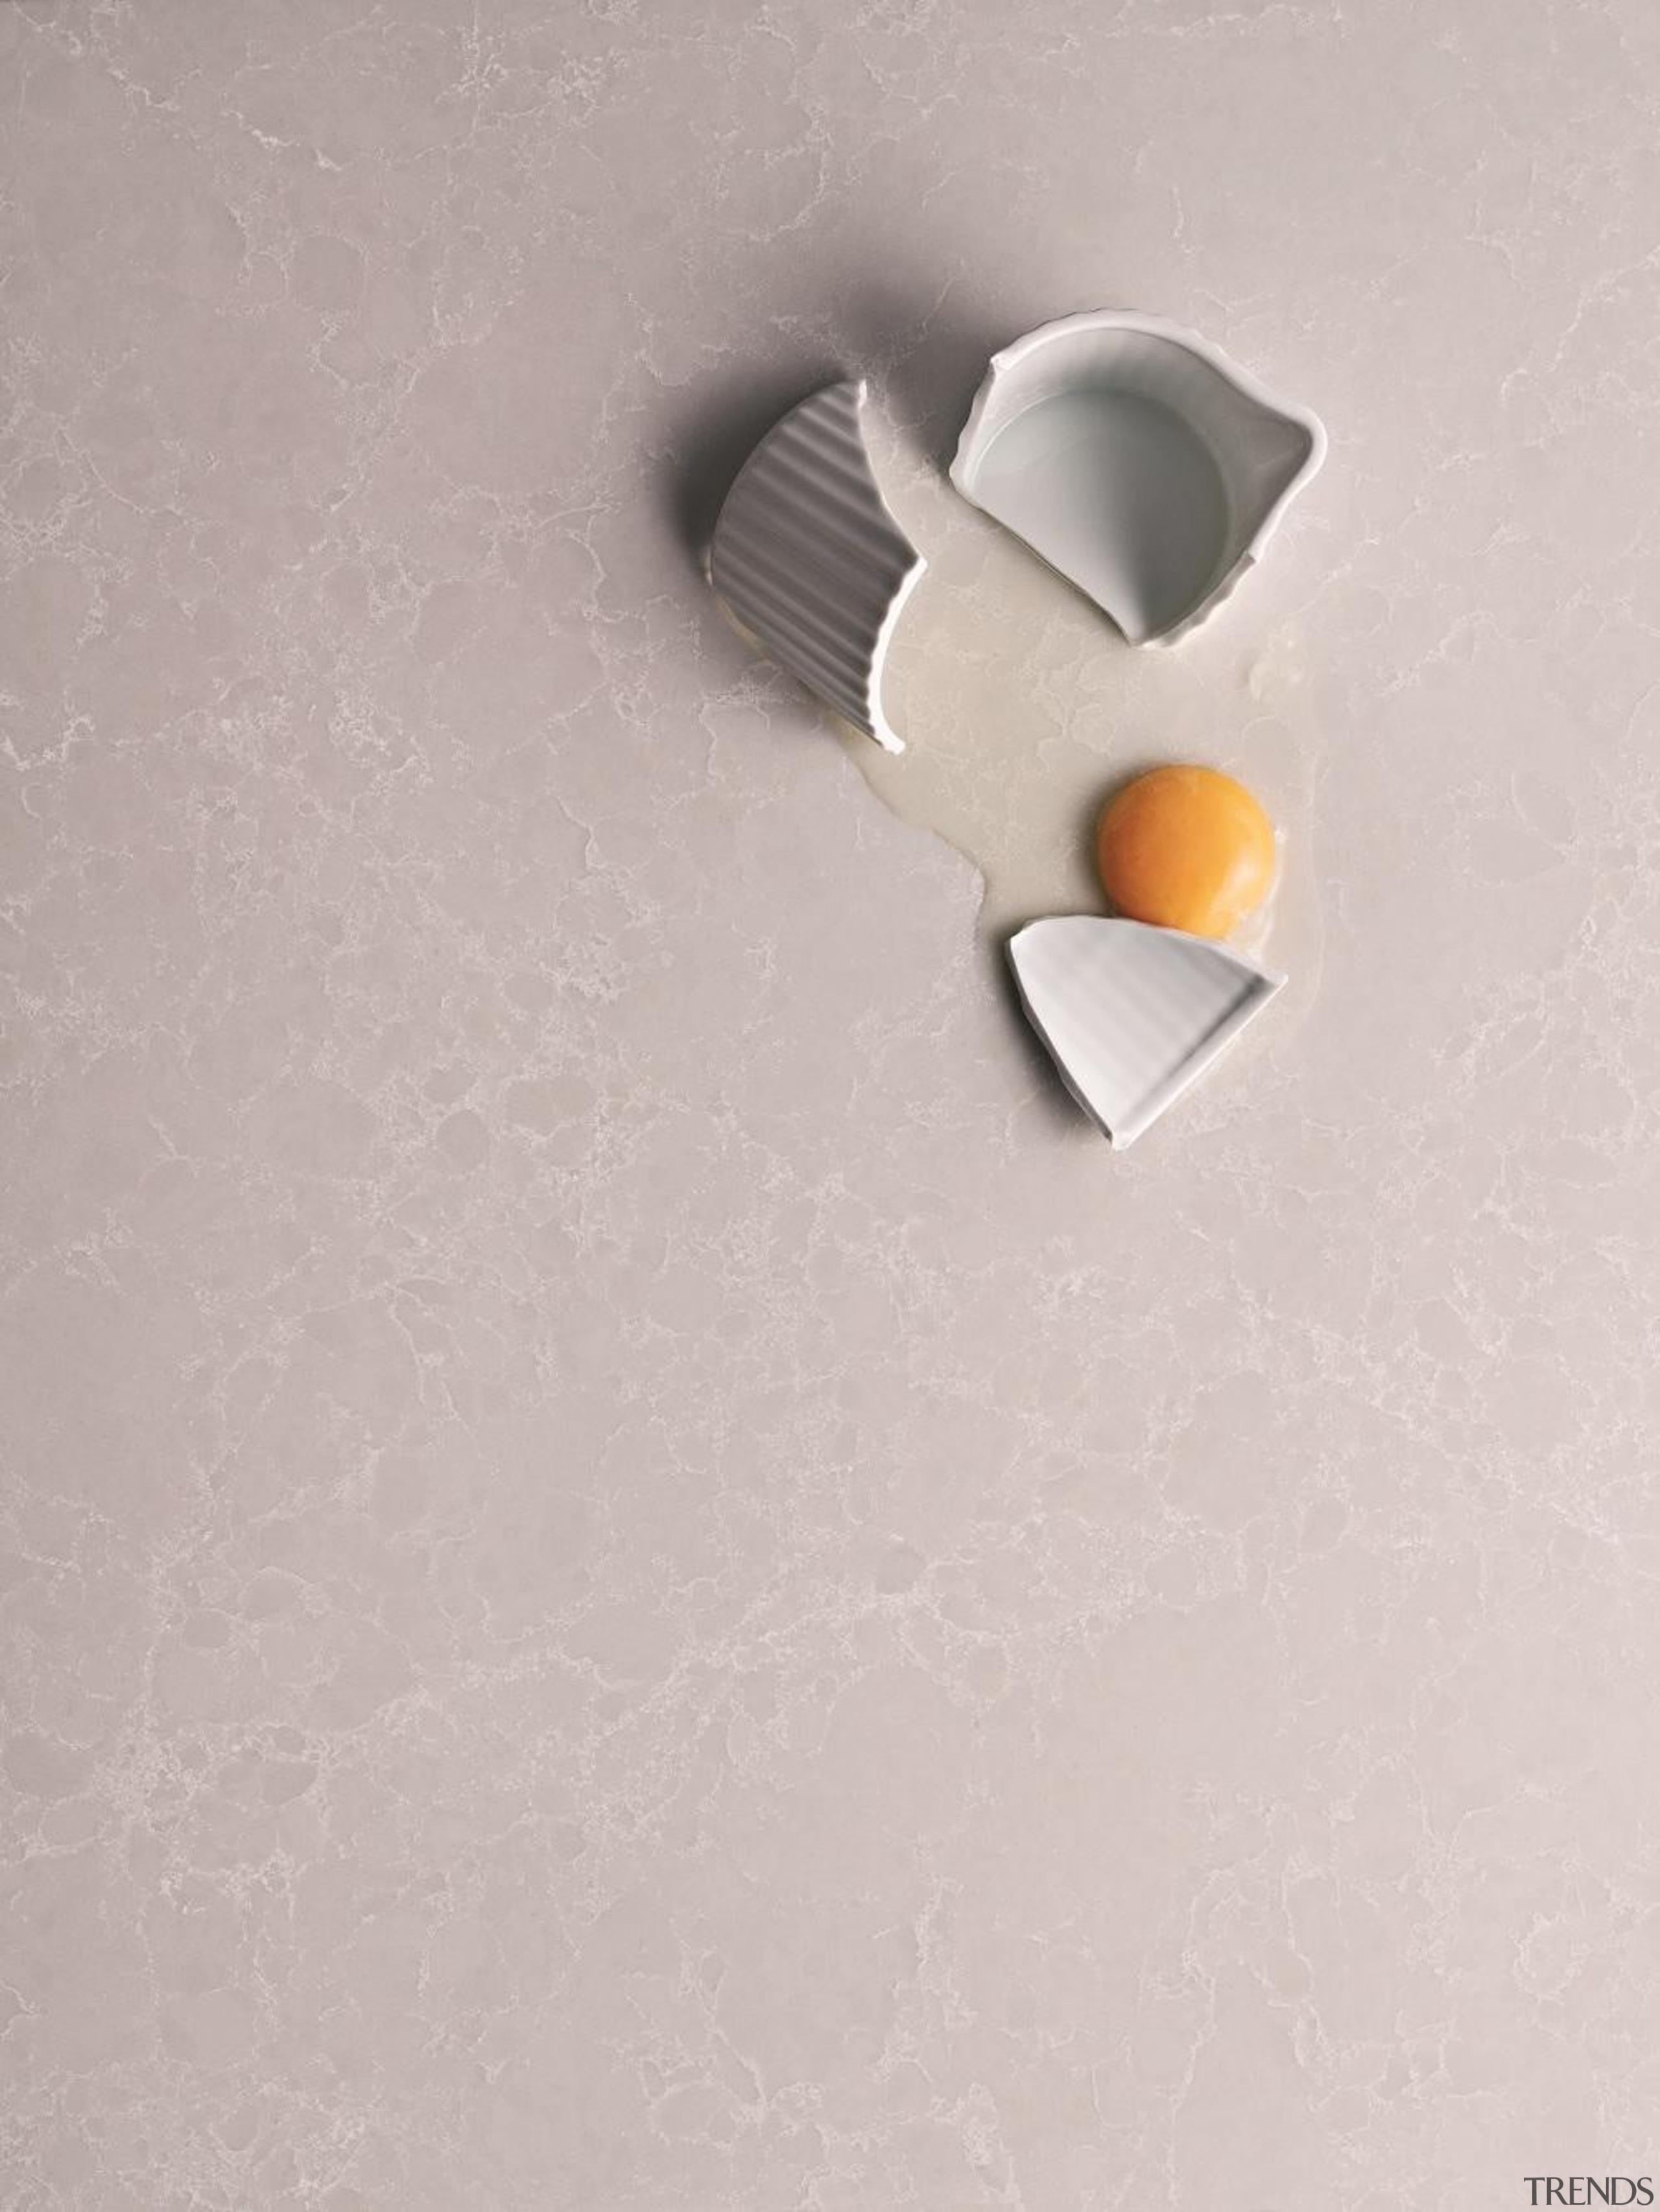 5110alpine mist close up eggs.jpg - 5110alpine_mist_close_up_eggs.jpg - product design, gray